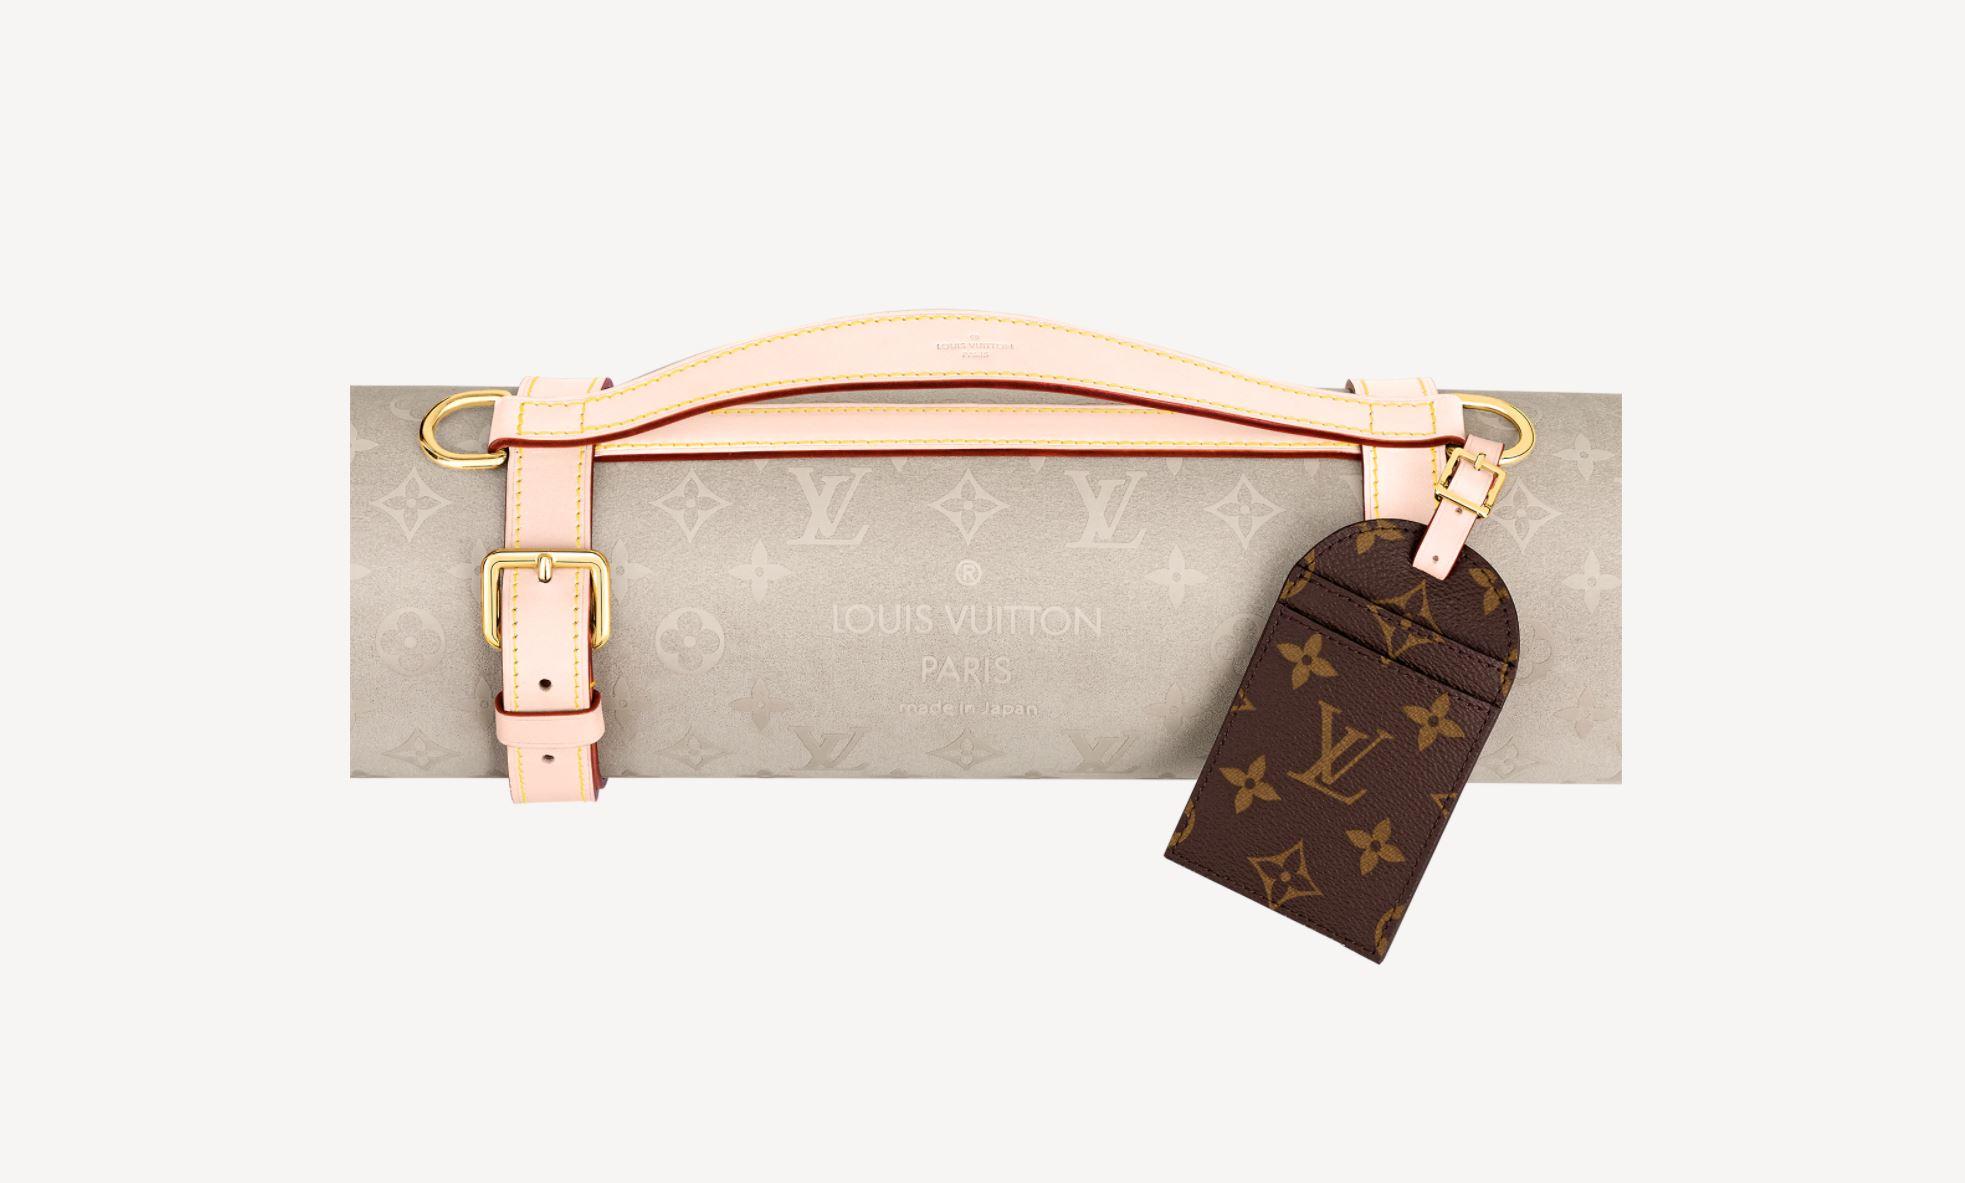 2. kép: Louis Vuitton jógamatrac